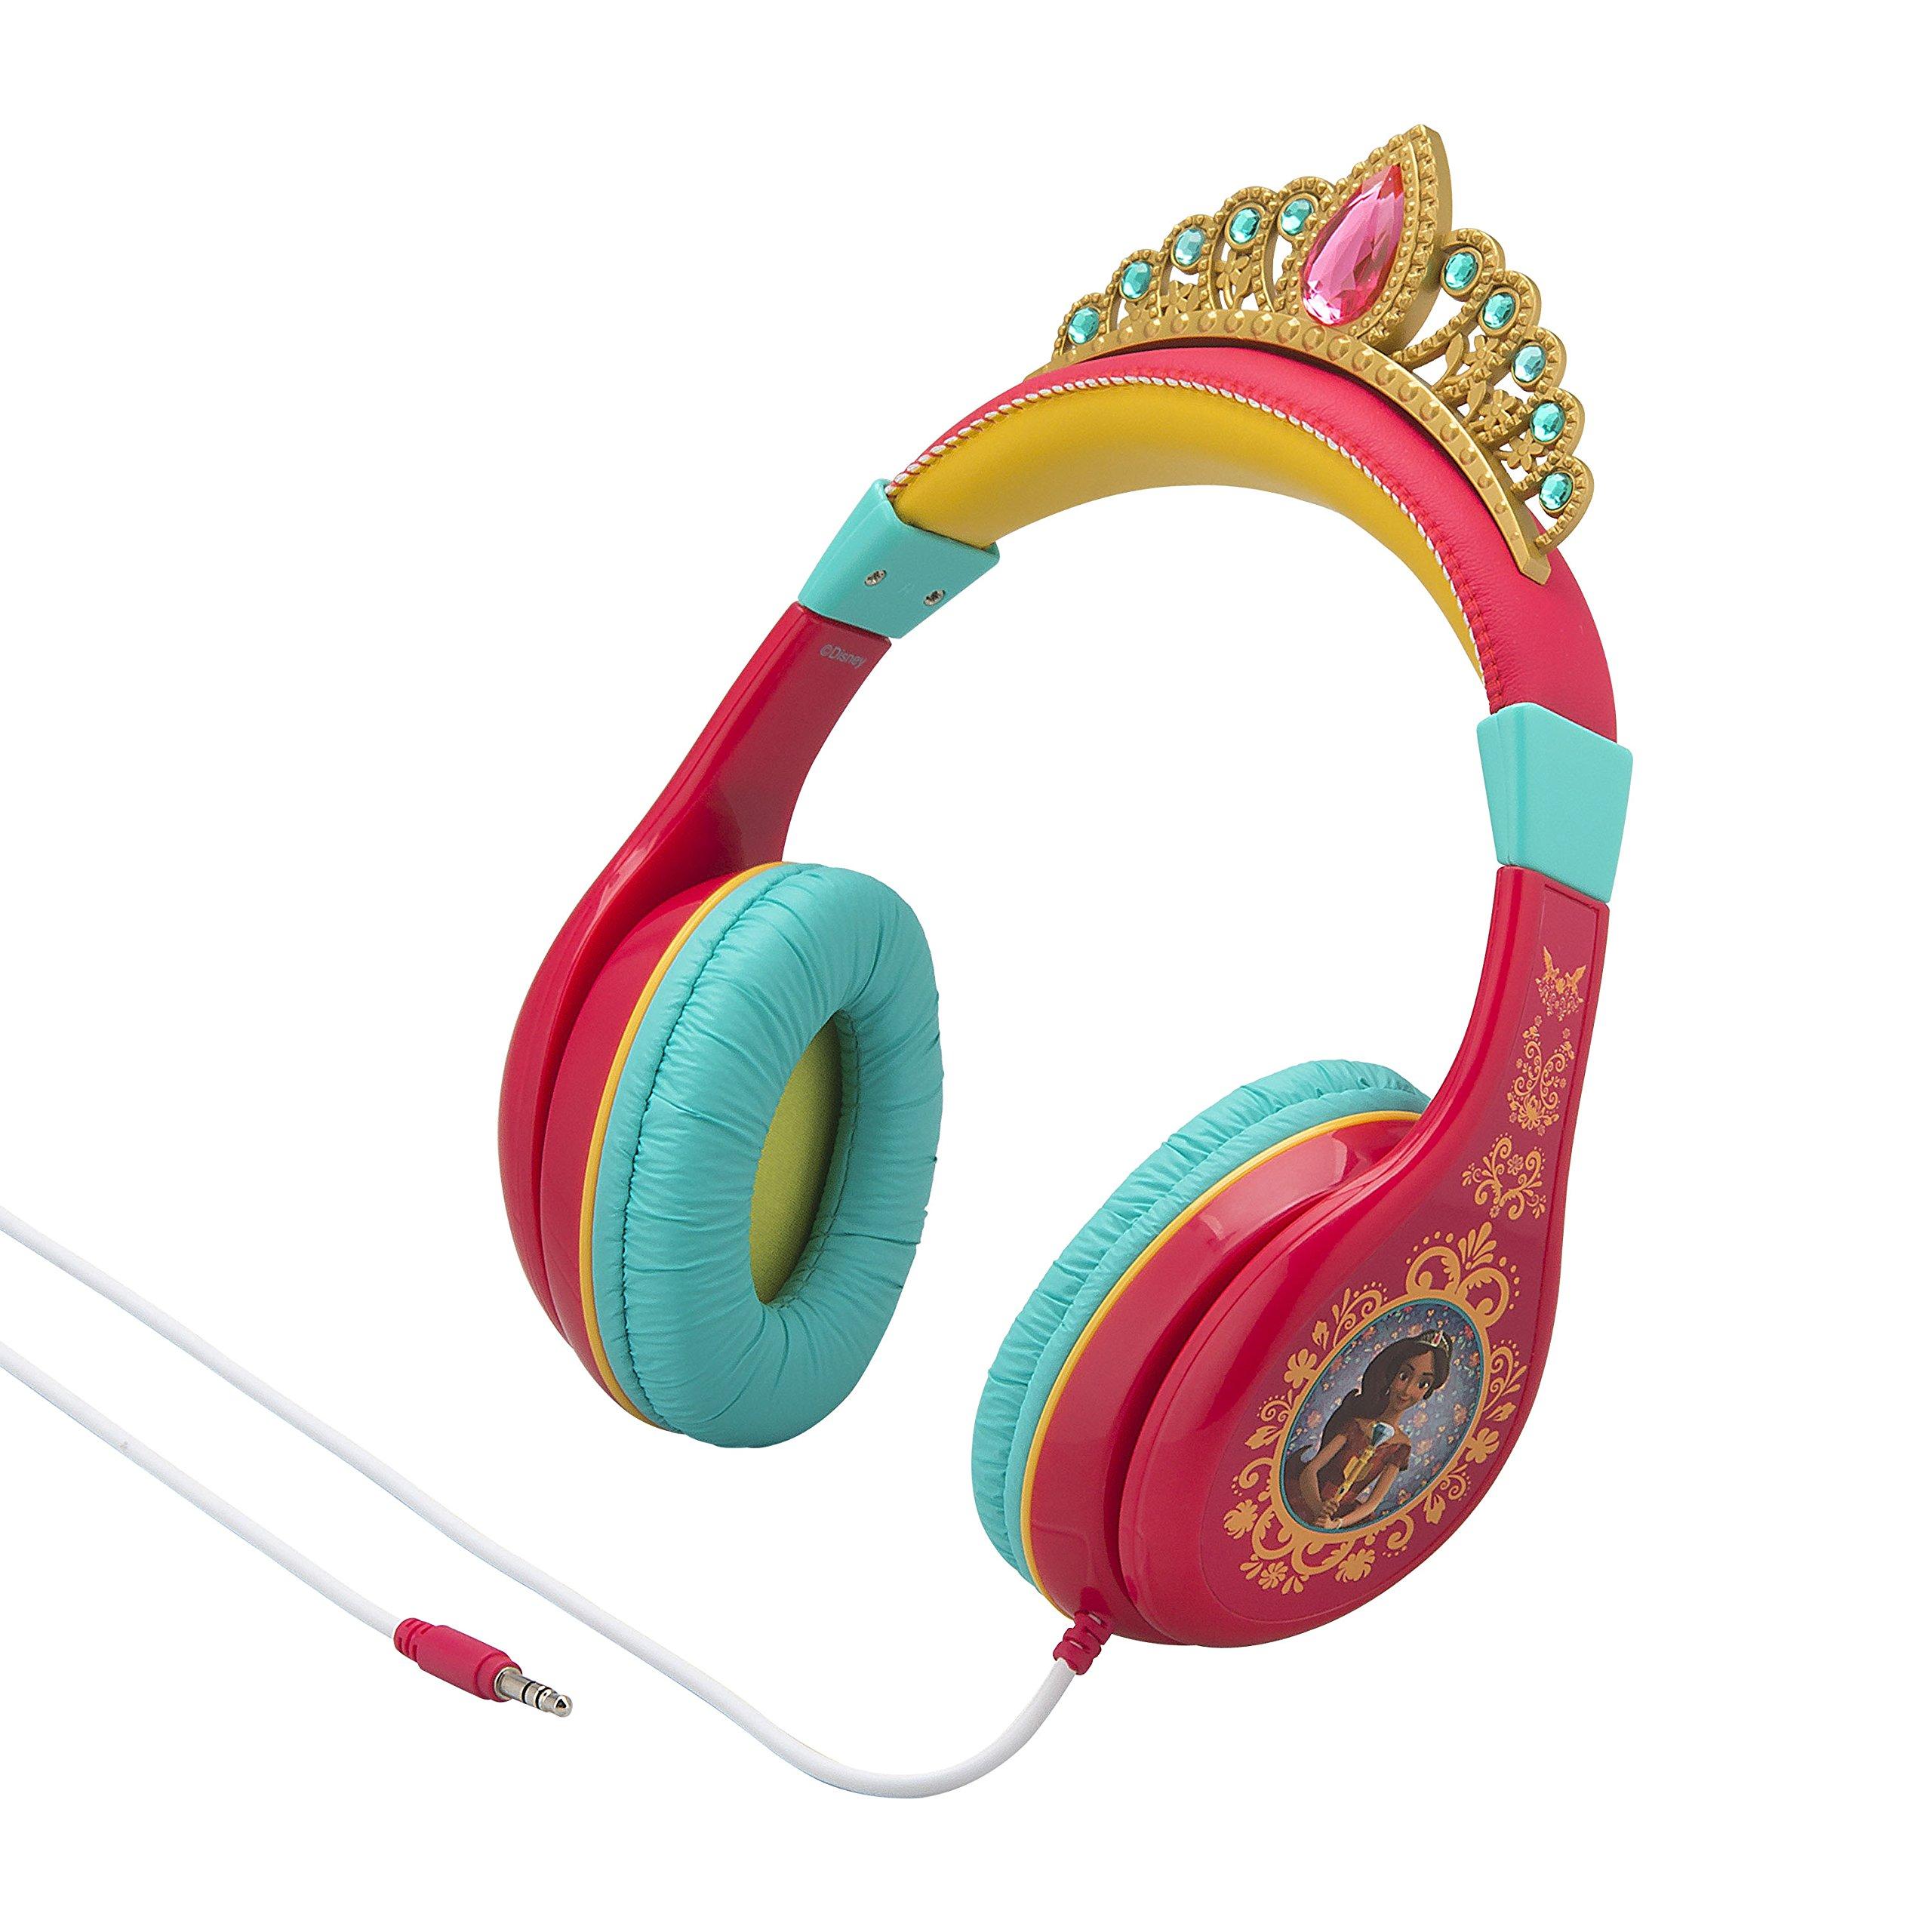 Disney Elena Of Avalor Headphones – Princess Elena Headphones With Crown Detailing! Volume Limiting Headphones In Fun Tiara Headphones Style